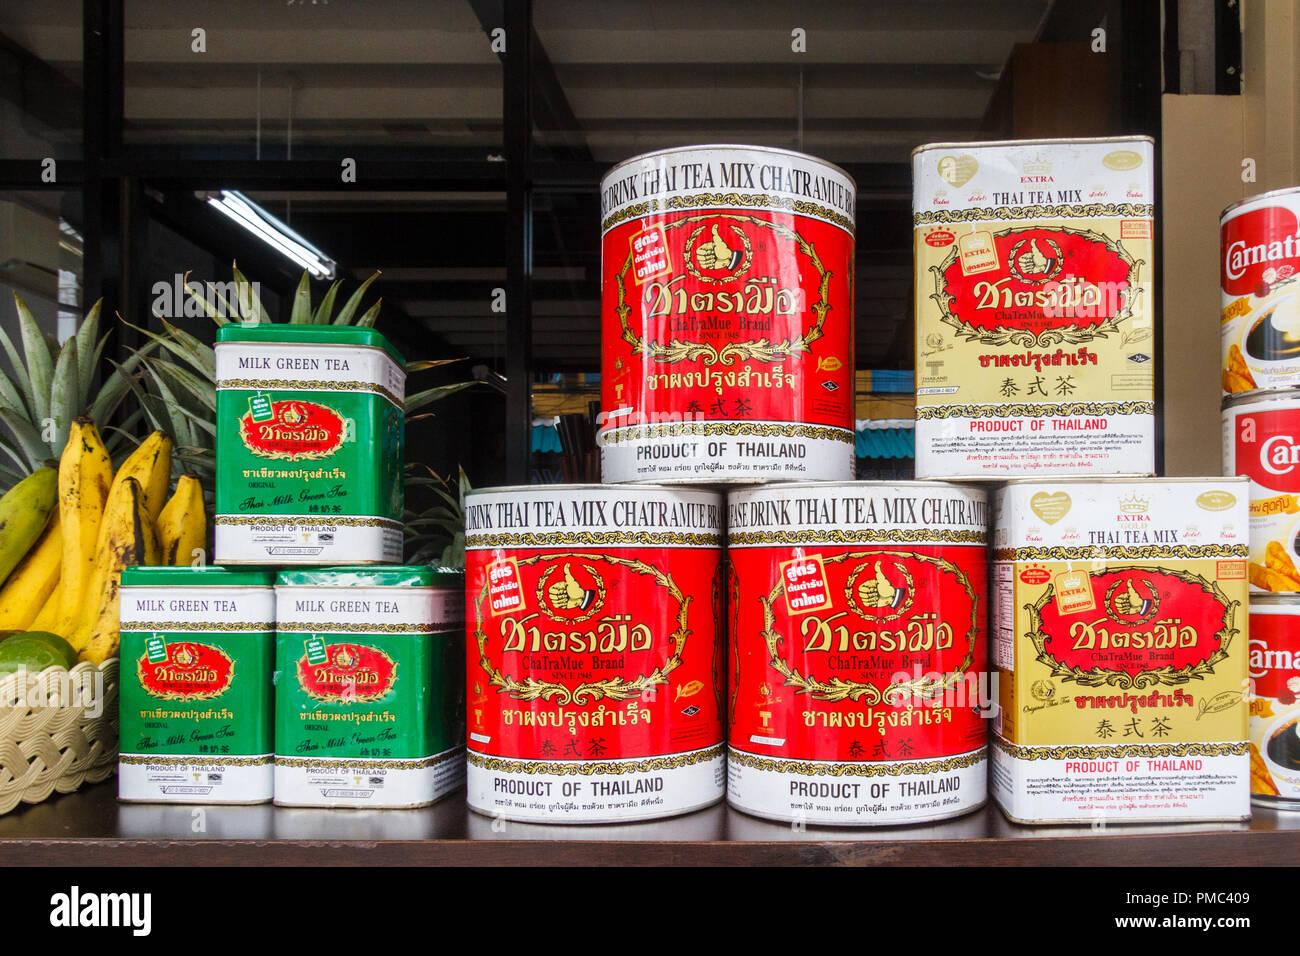 Phuket Town, Thailand - 6th August 2018: Tins of Thai tea. Milky tea is a popular drink. - Stock Image